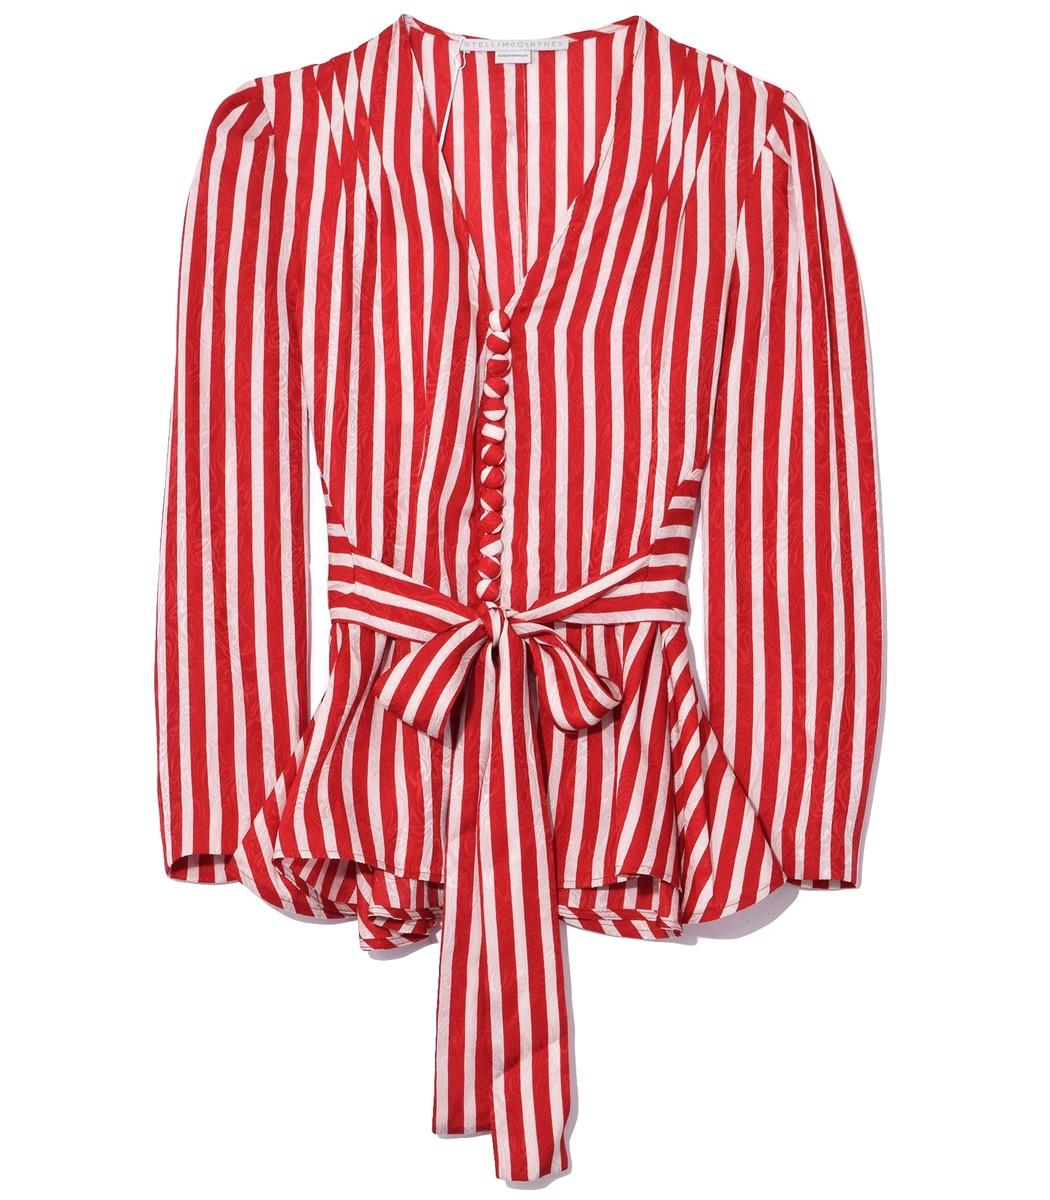 STELLA MCCARTNEY Bone/Lover Red Taylor Shirt